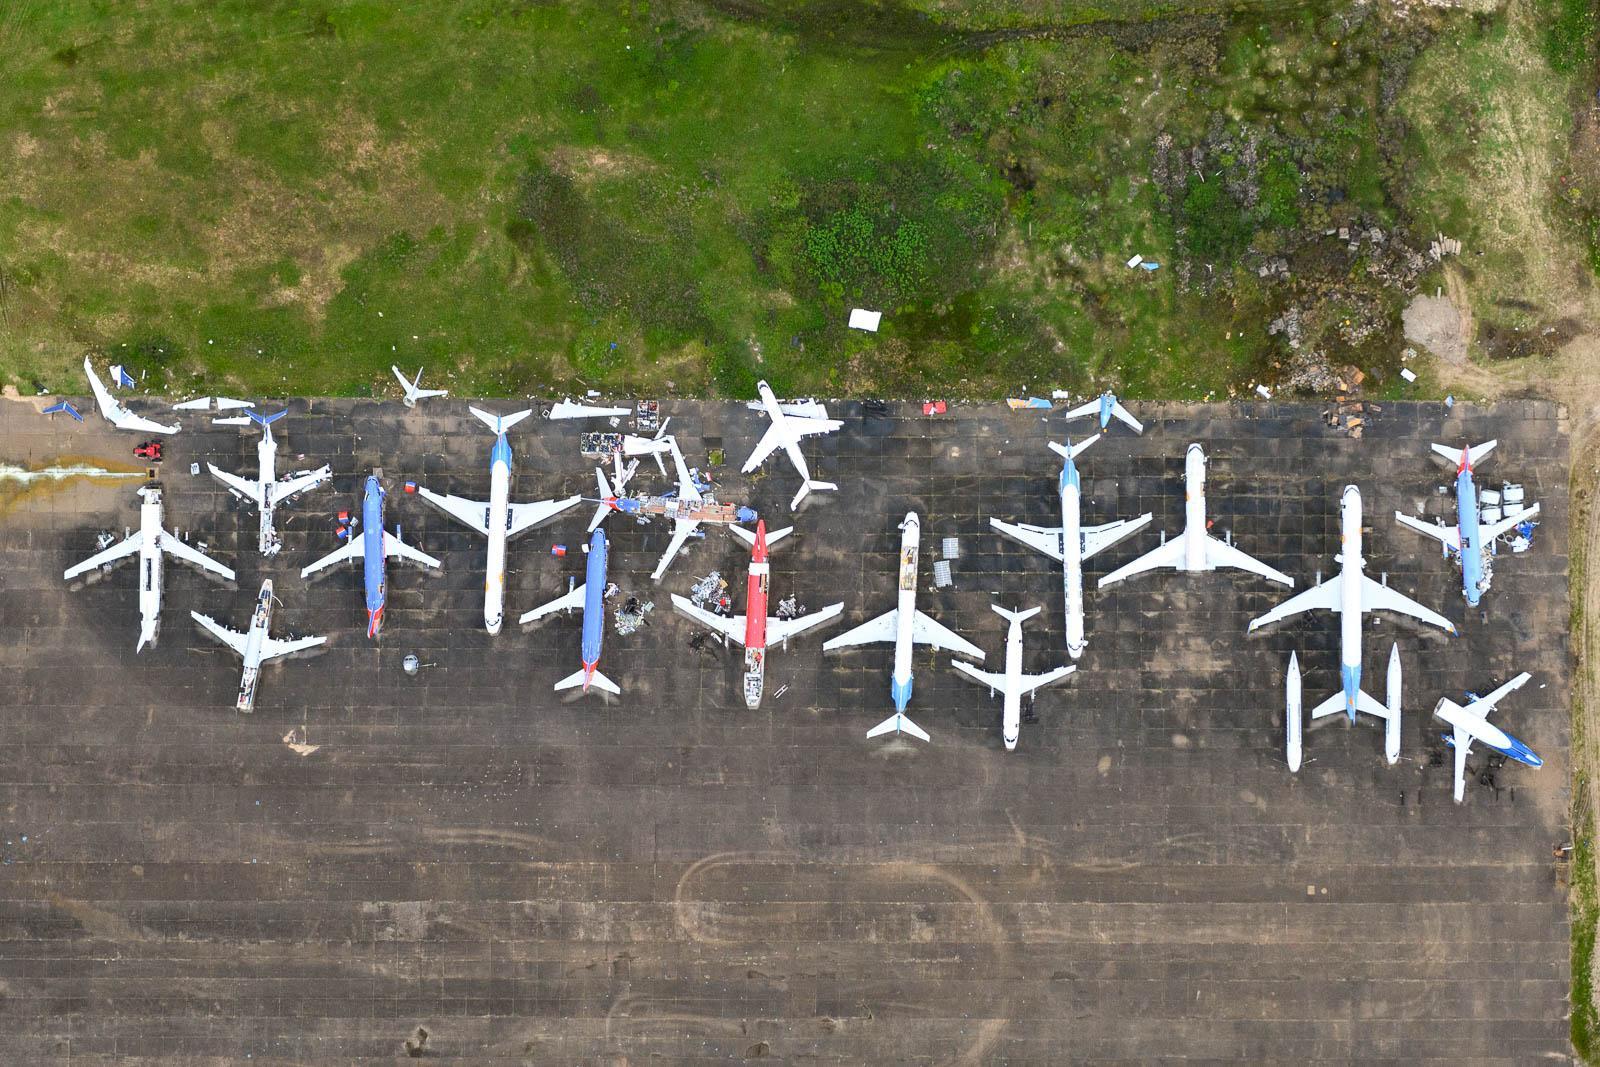 Airliner Storage & Disassembly at Stuttgart Airport in Arkansas